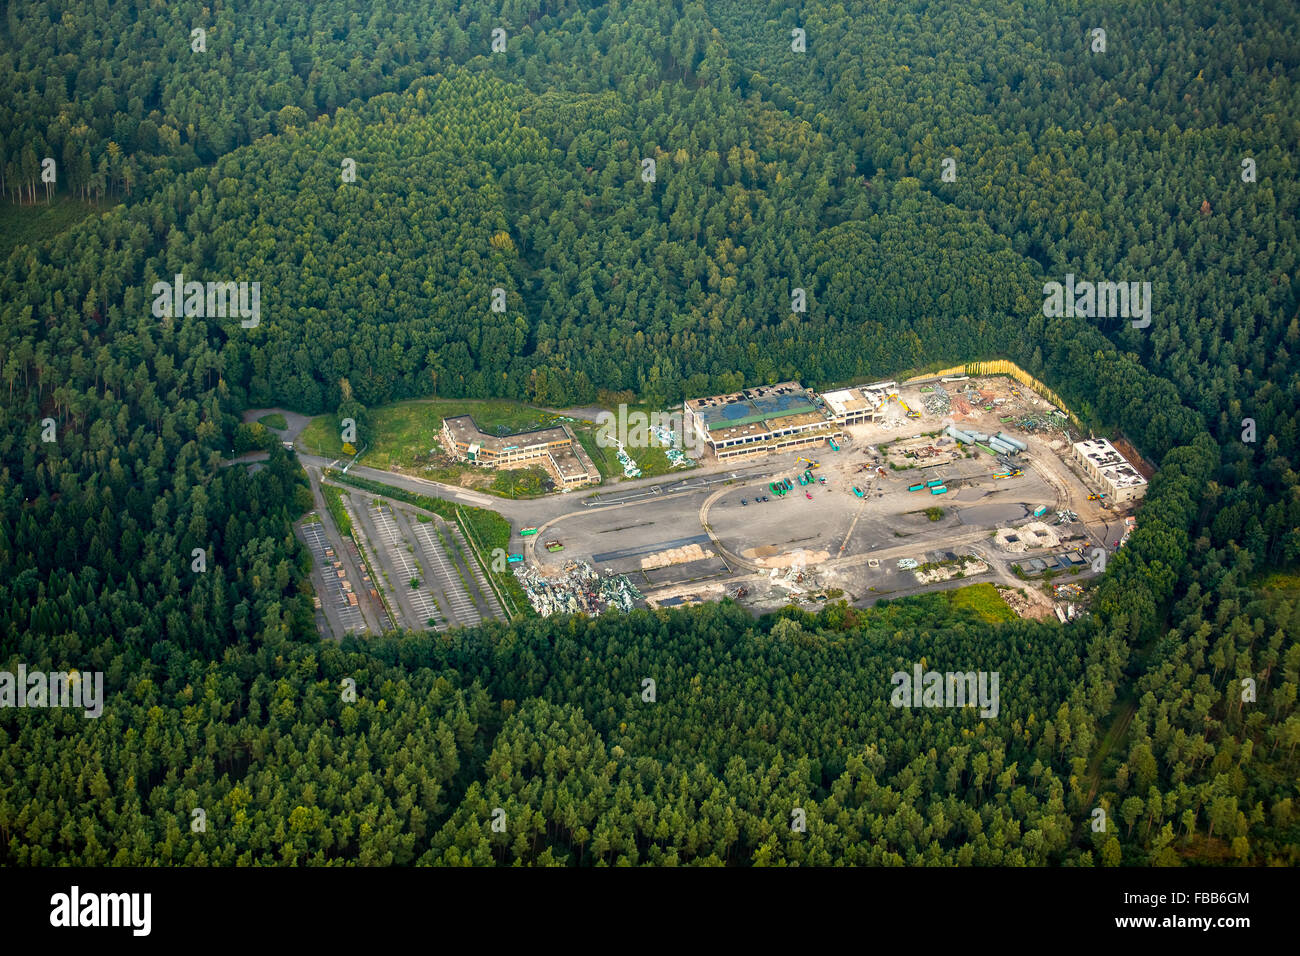 Aerial view, tear mine Haard mine holders 1/2, mining, structural change, Oer-Erkenschwick, Münsterland, North - Stock Image